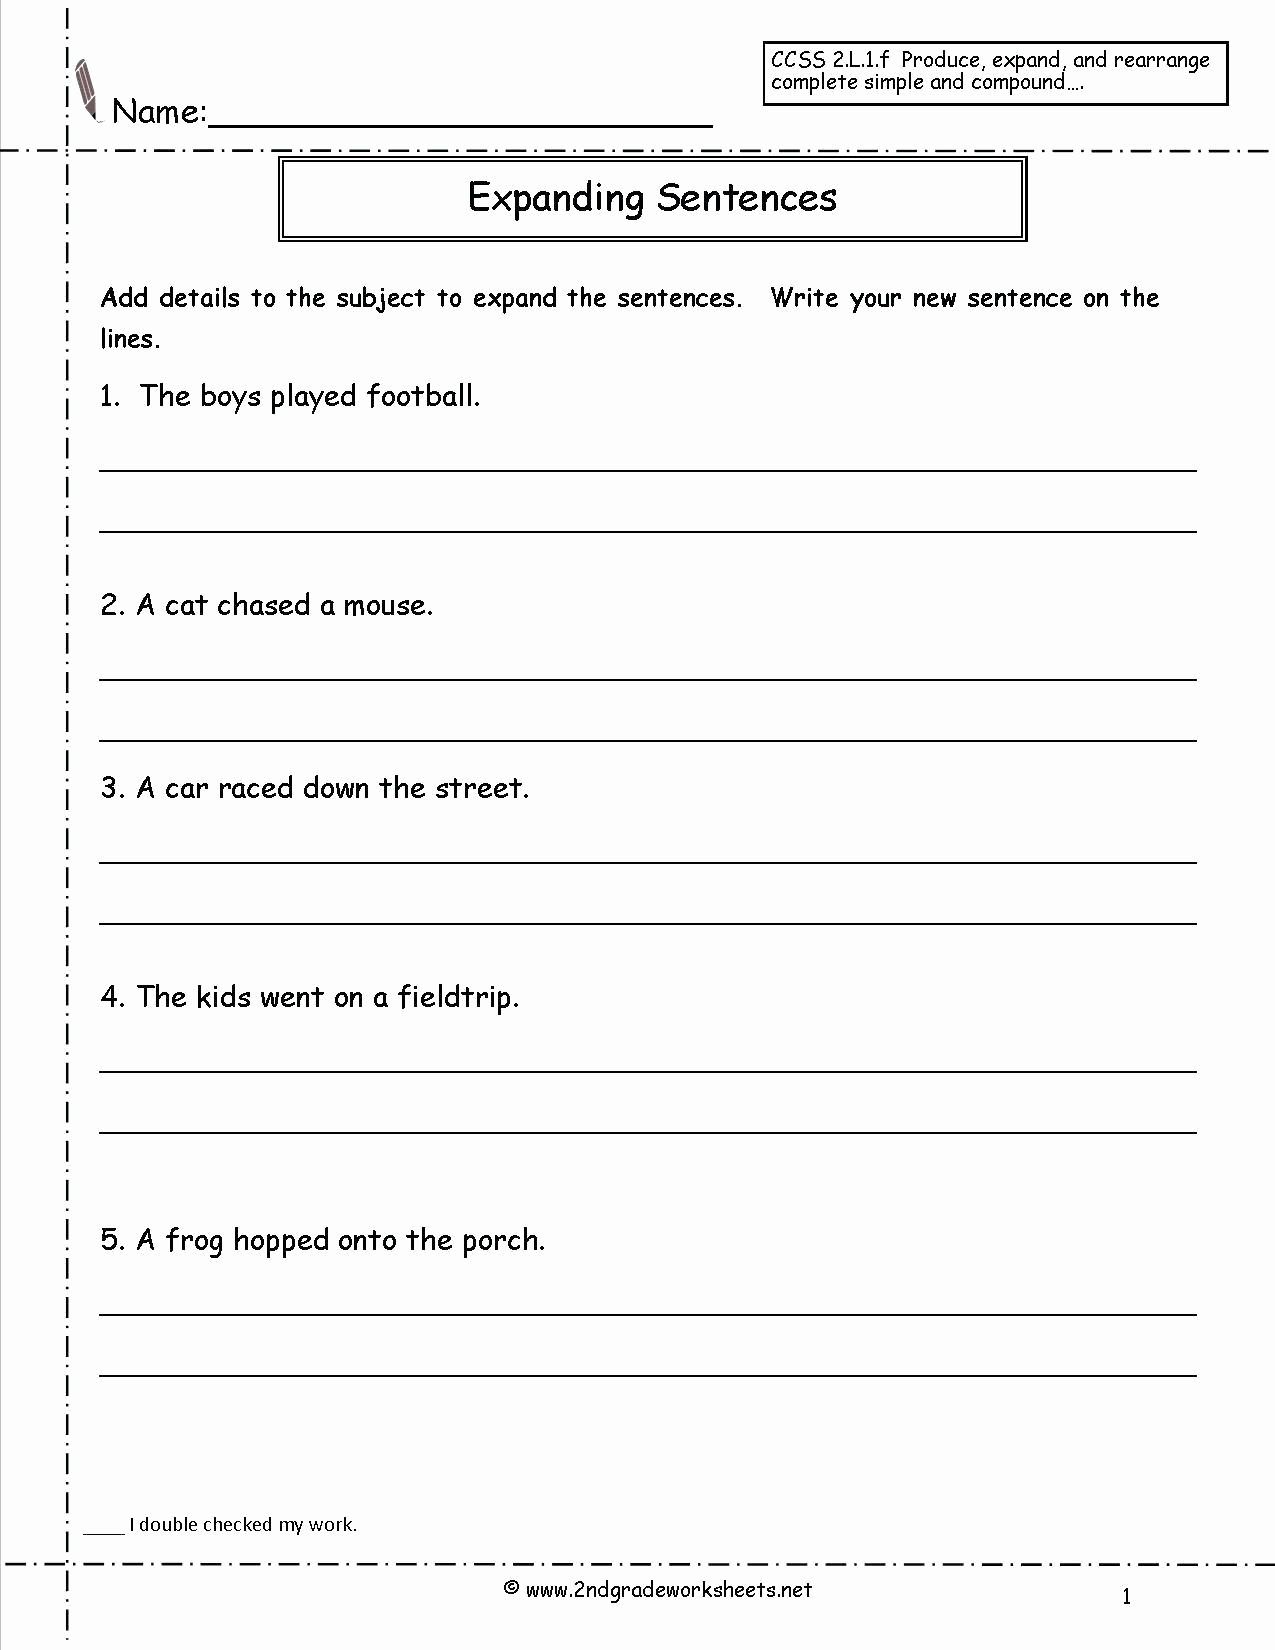 Free Paragraph Writing Worksheets Inspirational Free Printable Cursive Paragraph Worksheets